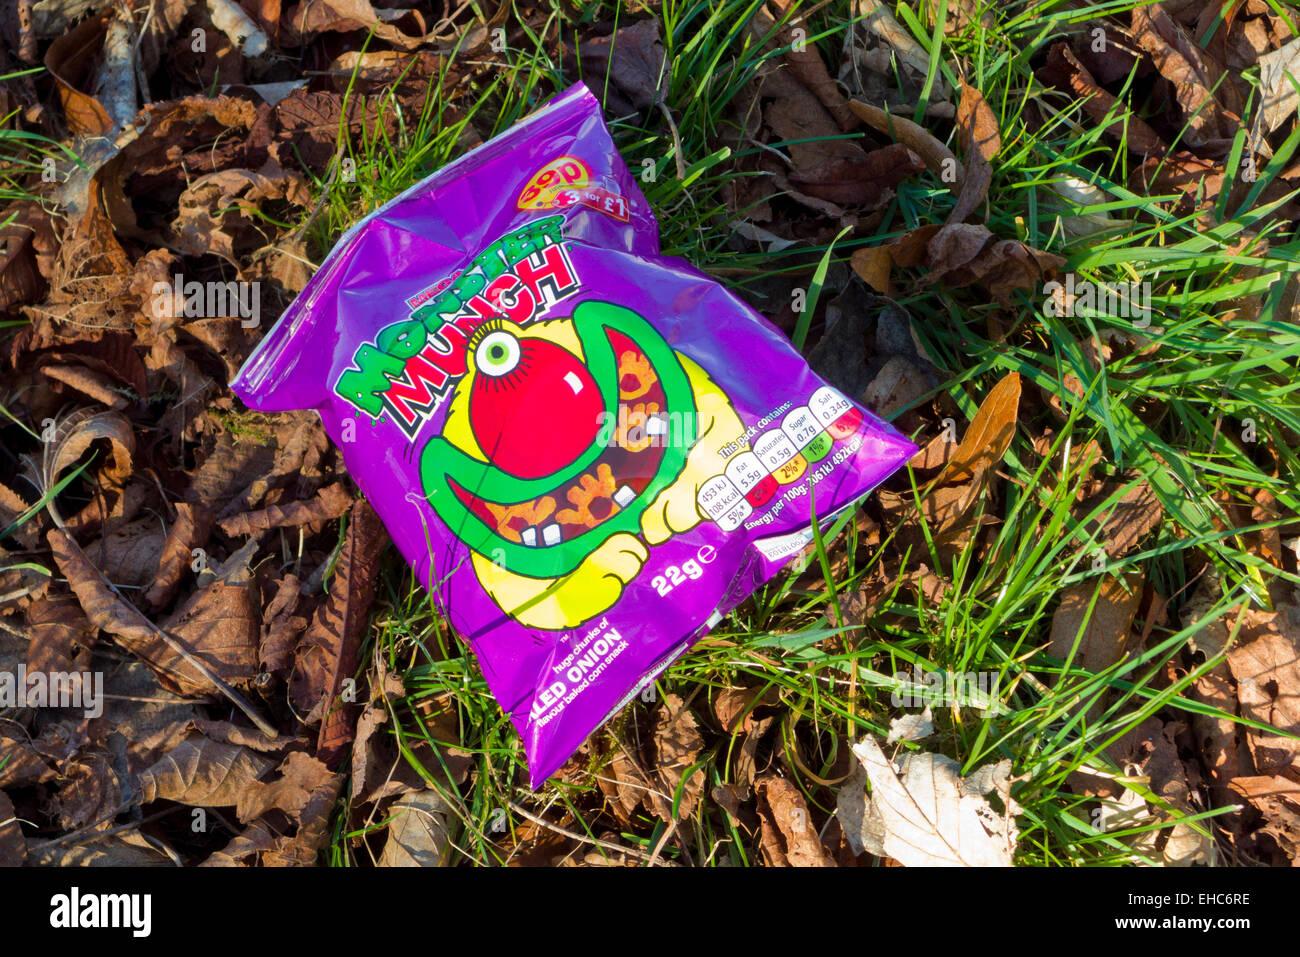 Empty Monster Munch Crisp Packet Littering a Lawn, UK - Stock Image